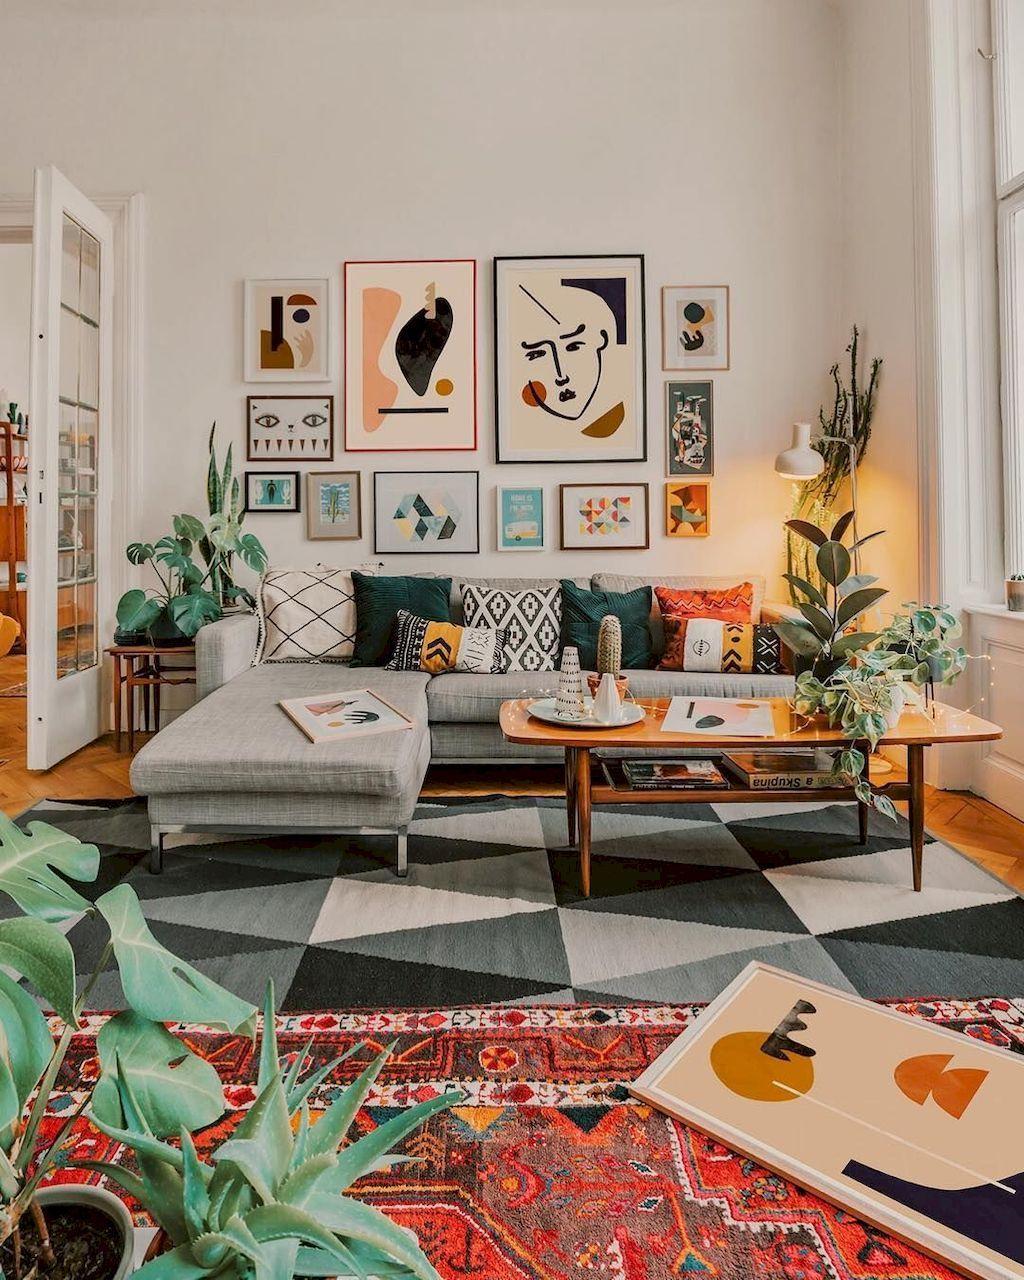 Cozy minimalist modern living room